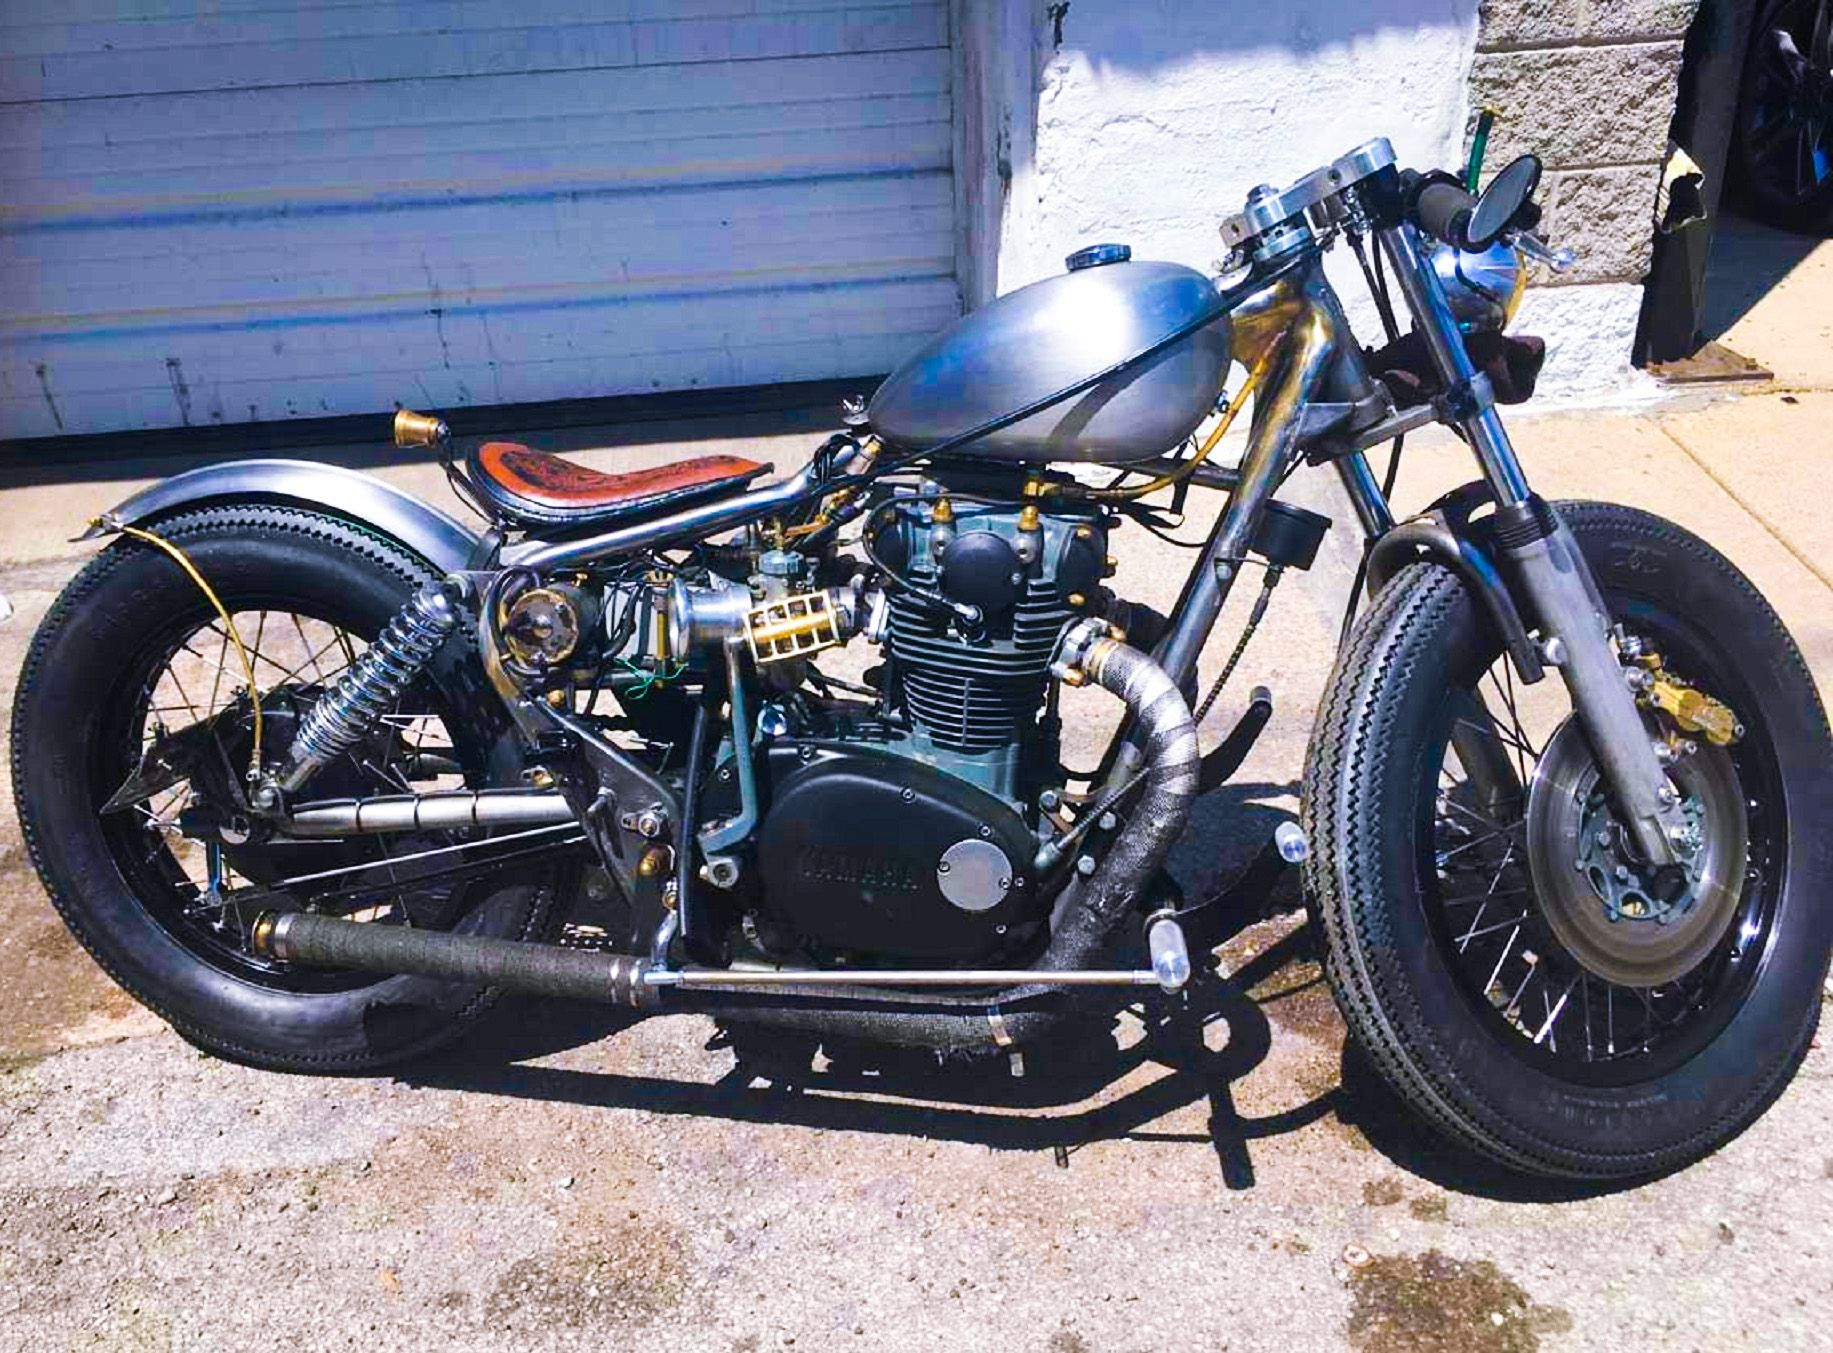 small resolution of 1976 yamaha xs650 brat style bobber http xs650chopper com 2016